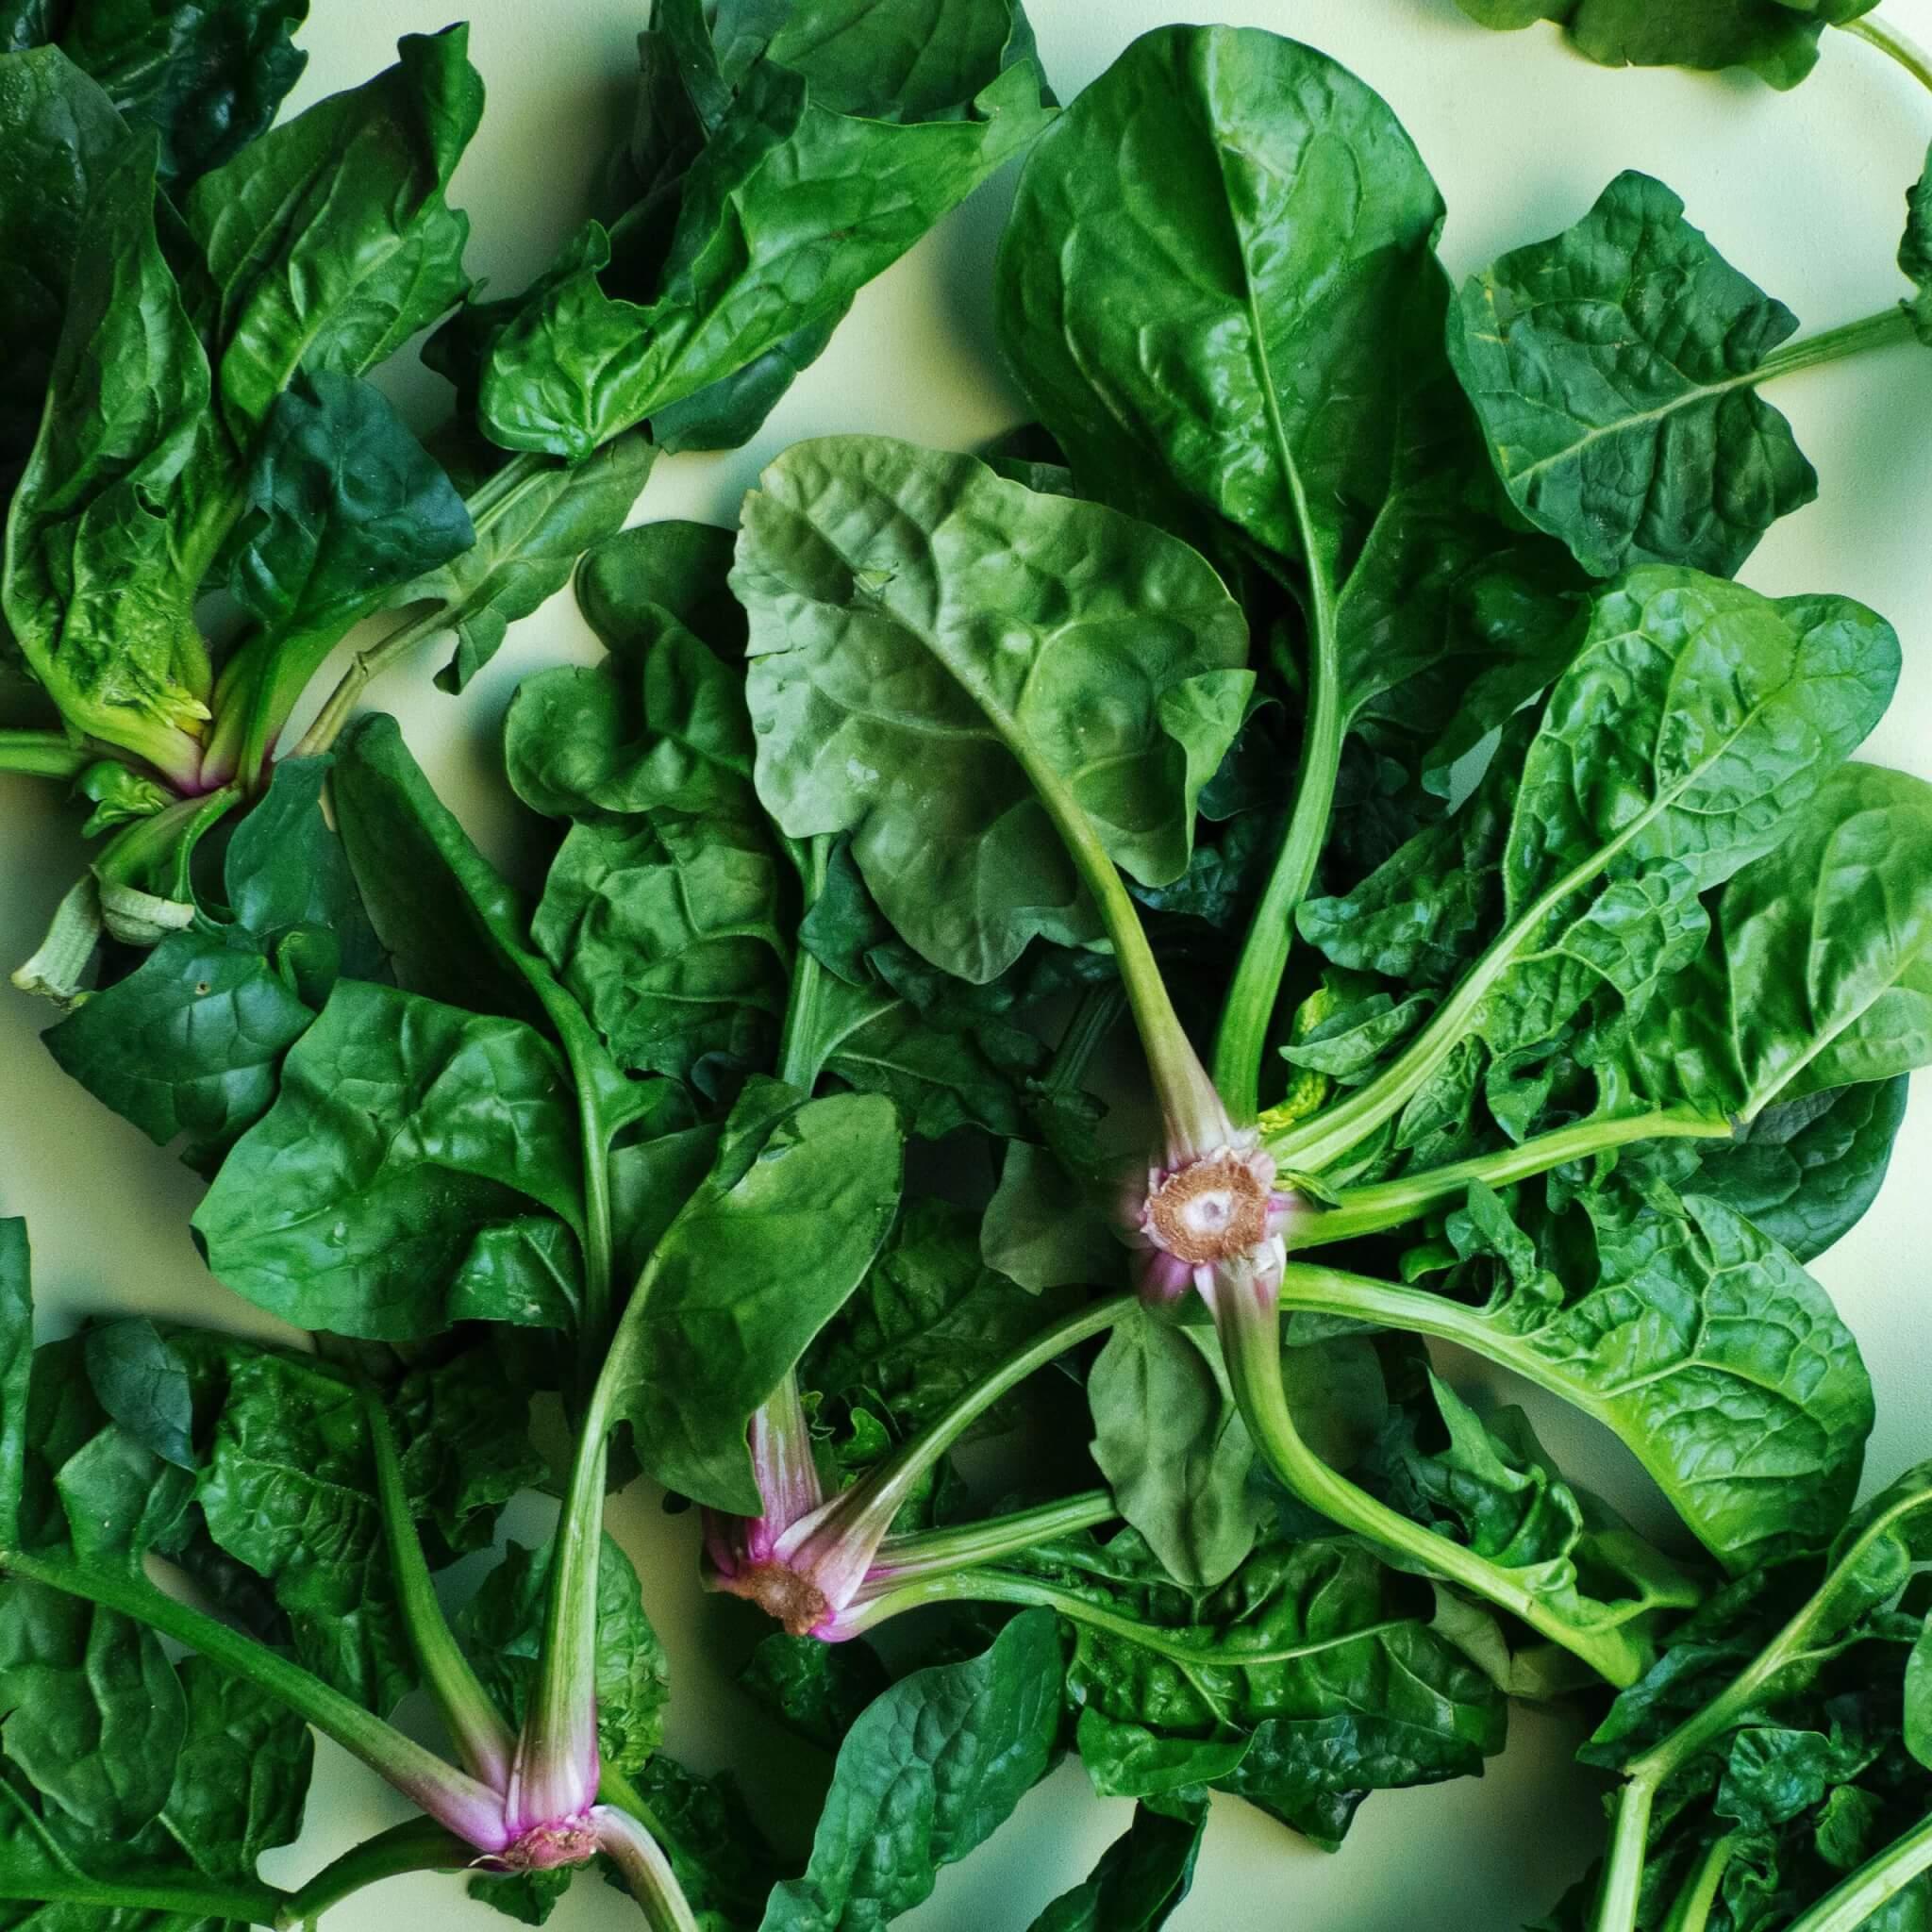 Wilde Wortels - foto green veggies - via unsplash van Foodism